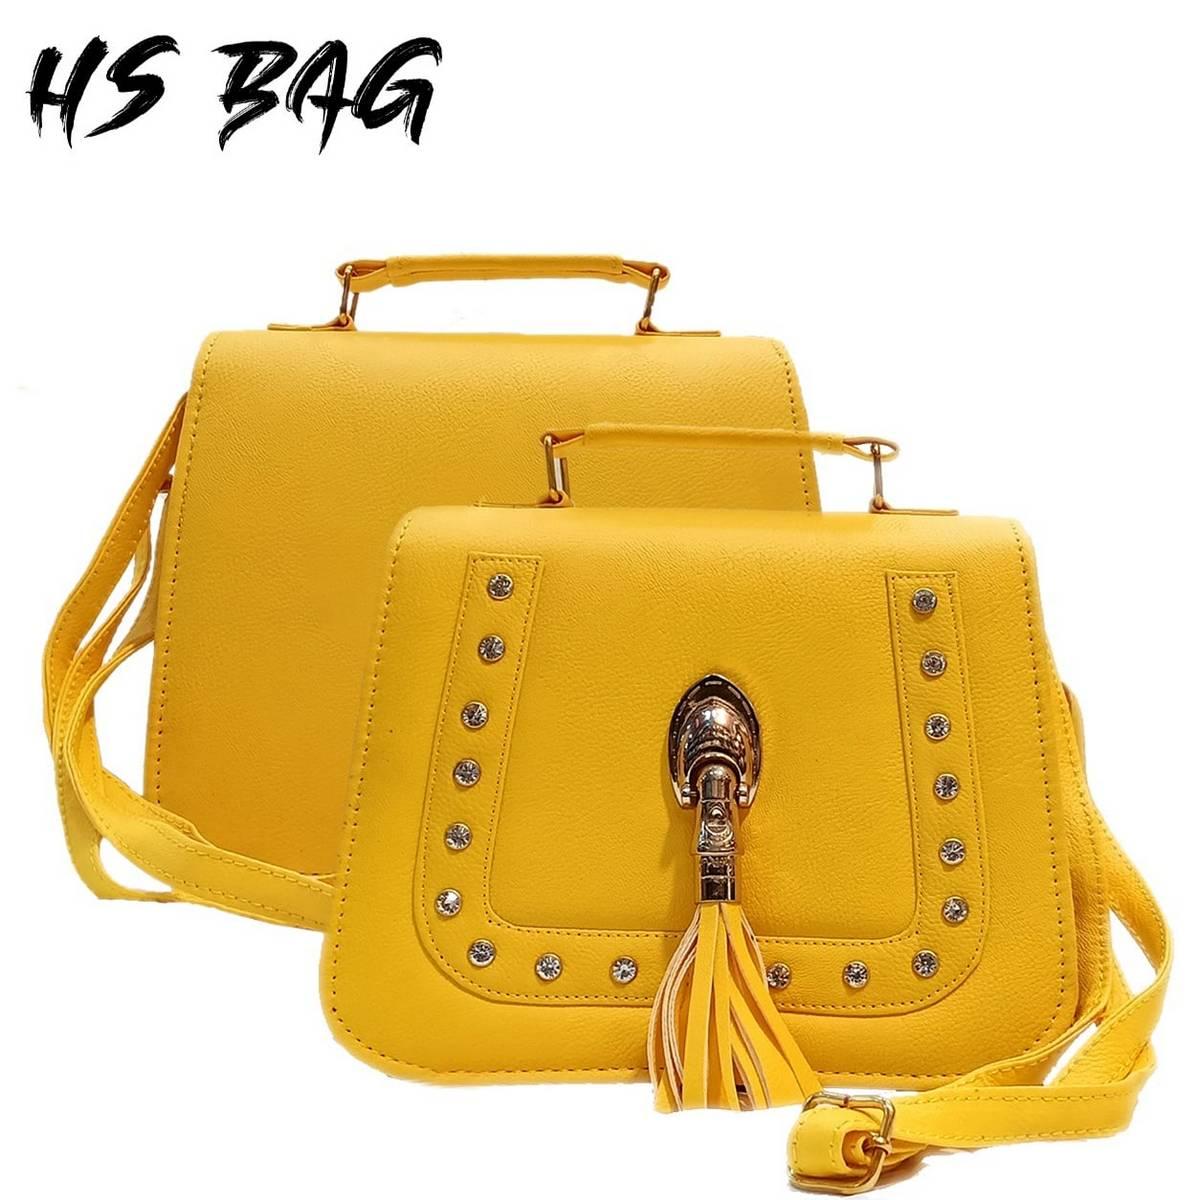 Small Stones Ladies Shoulder Bags Designer Satchel Tote Handbag